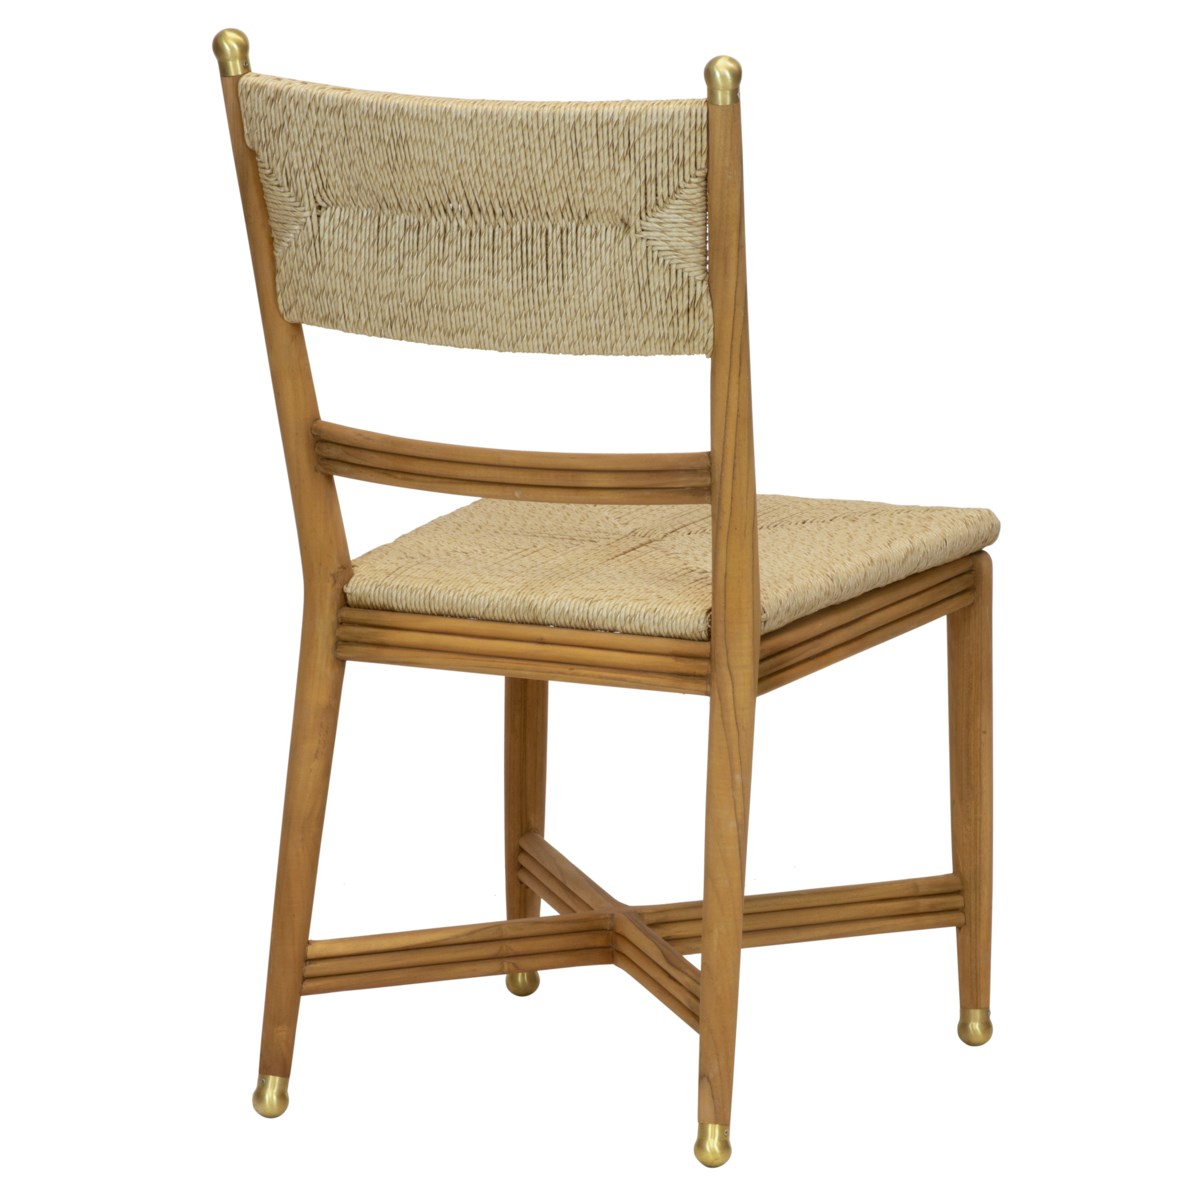 Kelmscott Side Chair in Natural